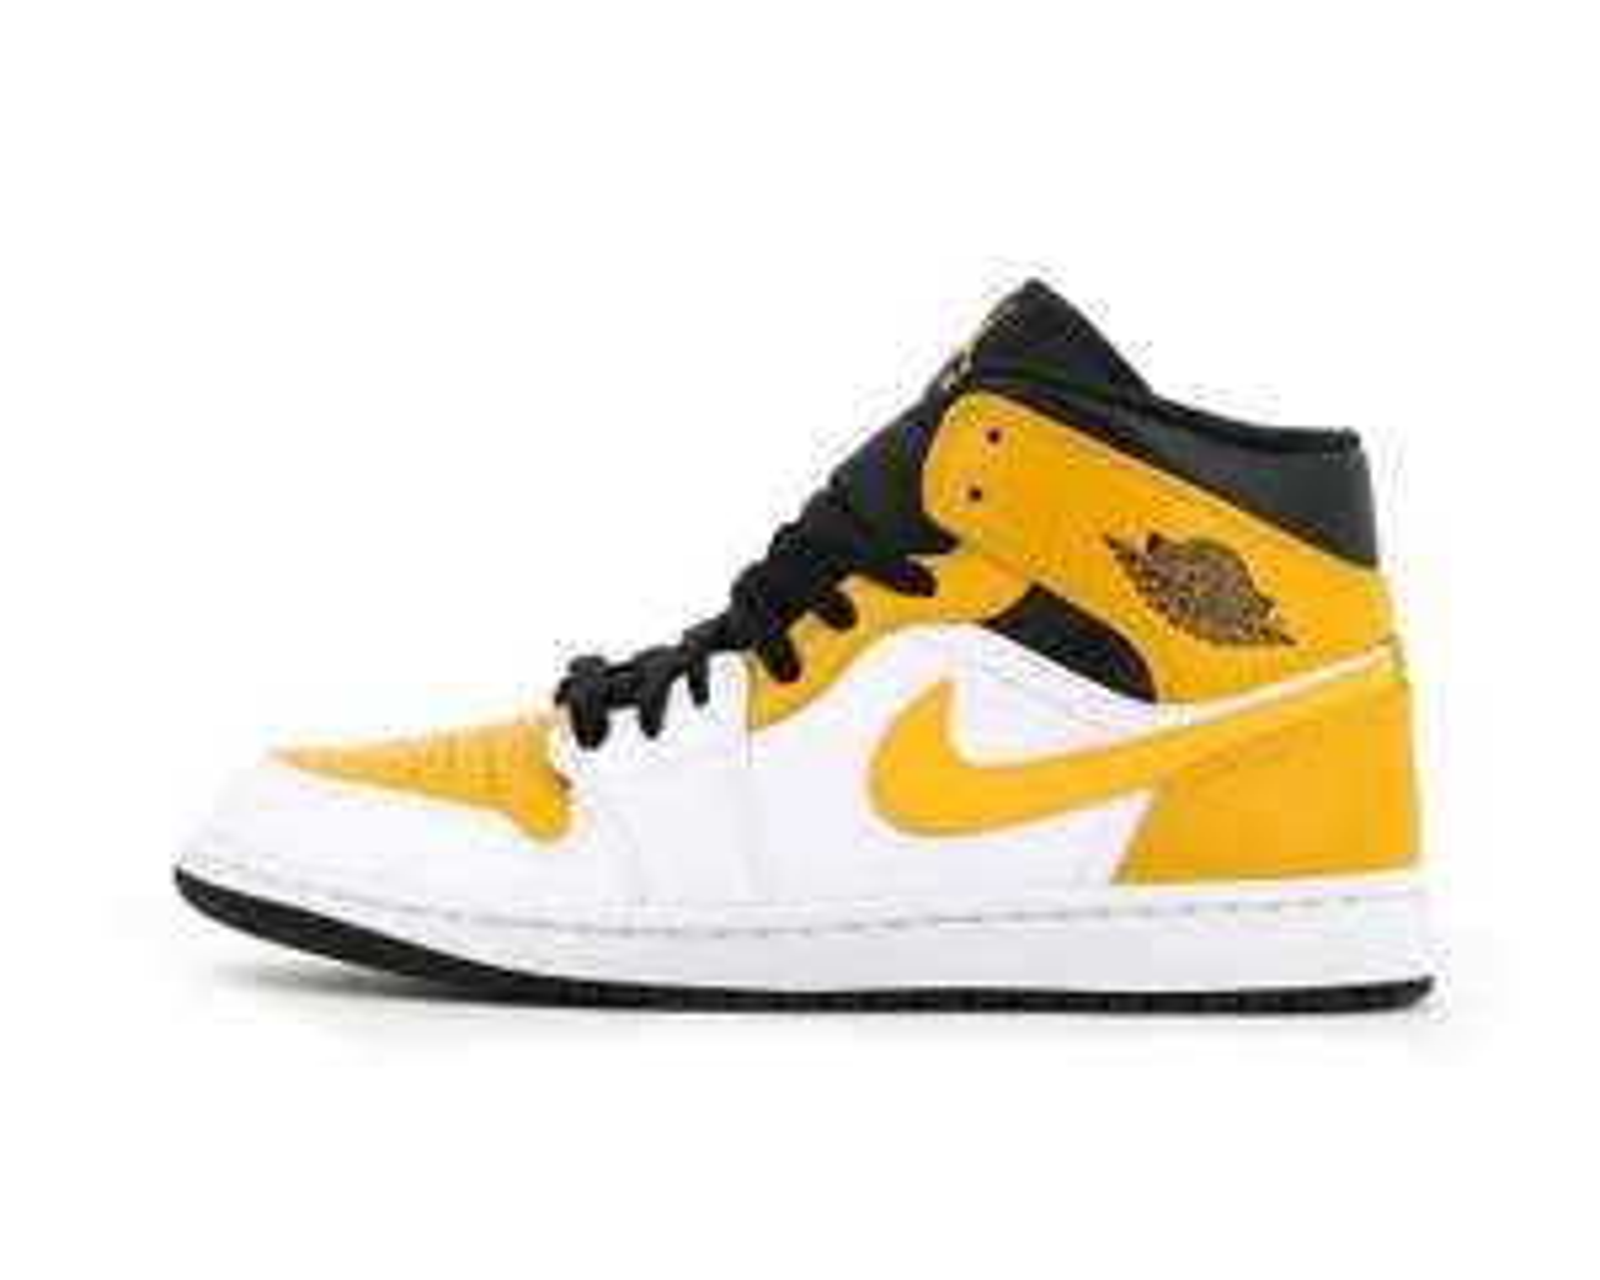 Baskets Nike Air Jordan 1 Mid University Gold (554724-170) - Du 42.5 au 46 (opiumparis.com)